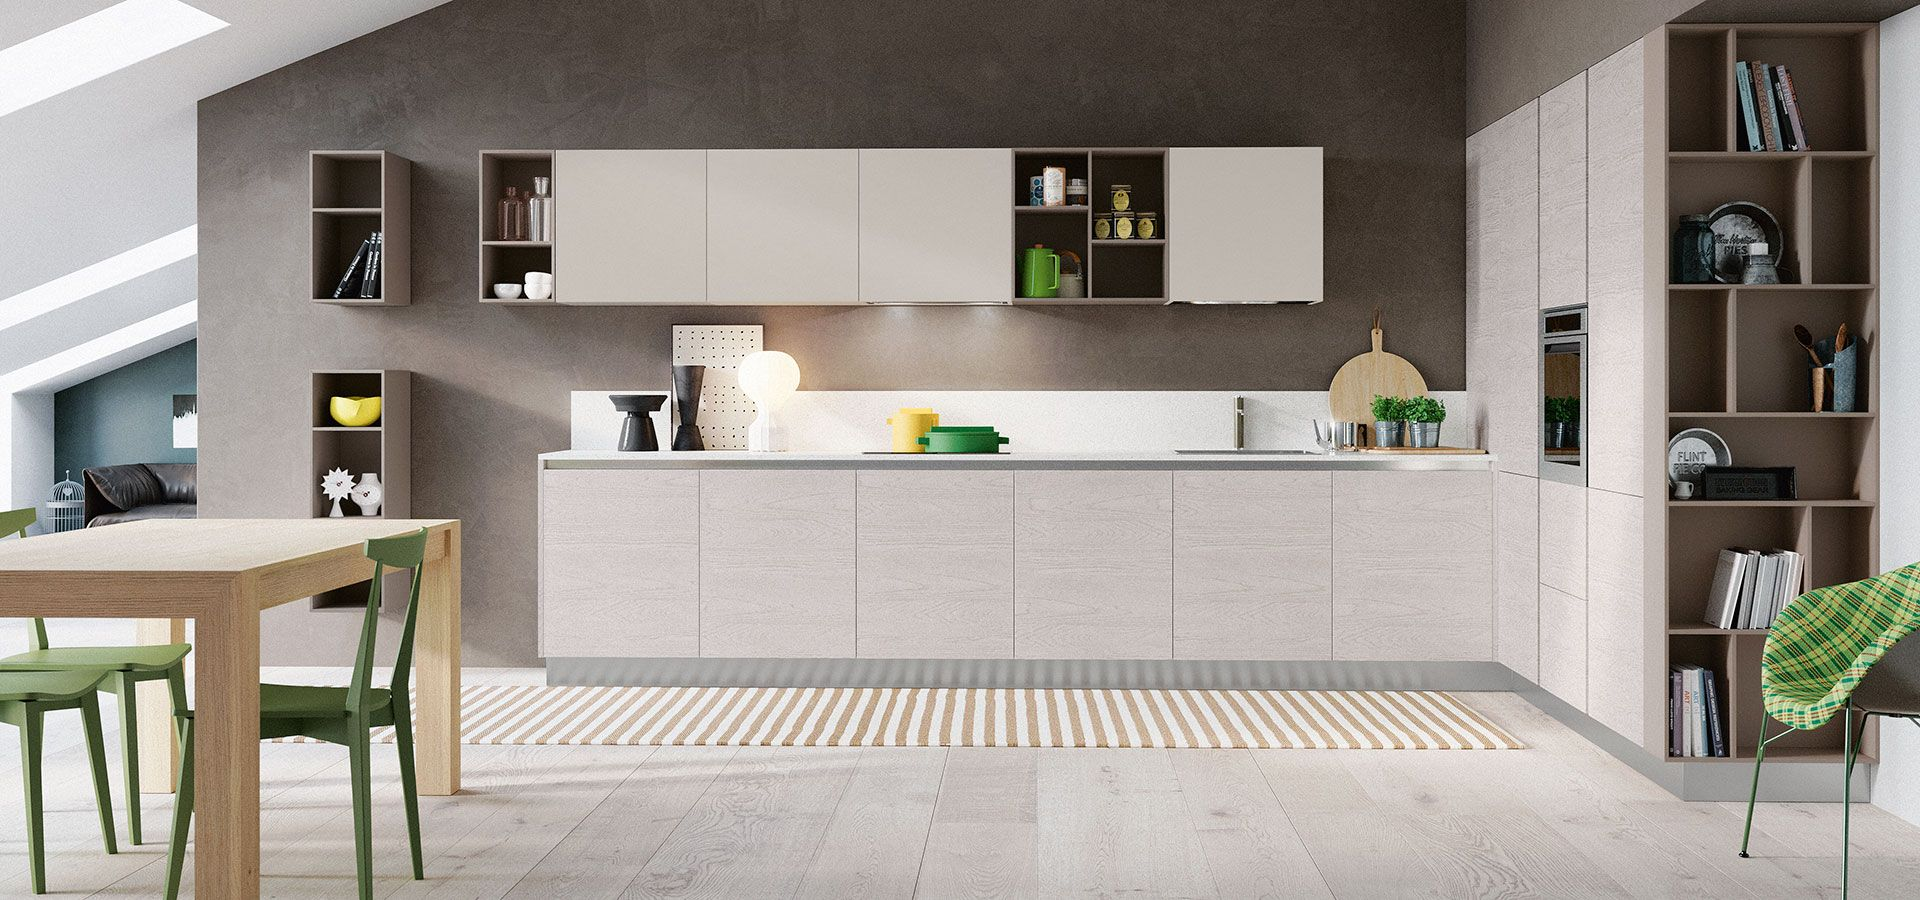 cucina moderna - cloe finitura rovere atlanta | pensili perla ... - Pensili Inox Per Cucina